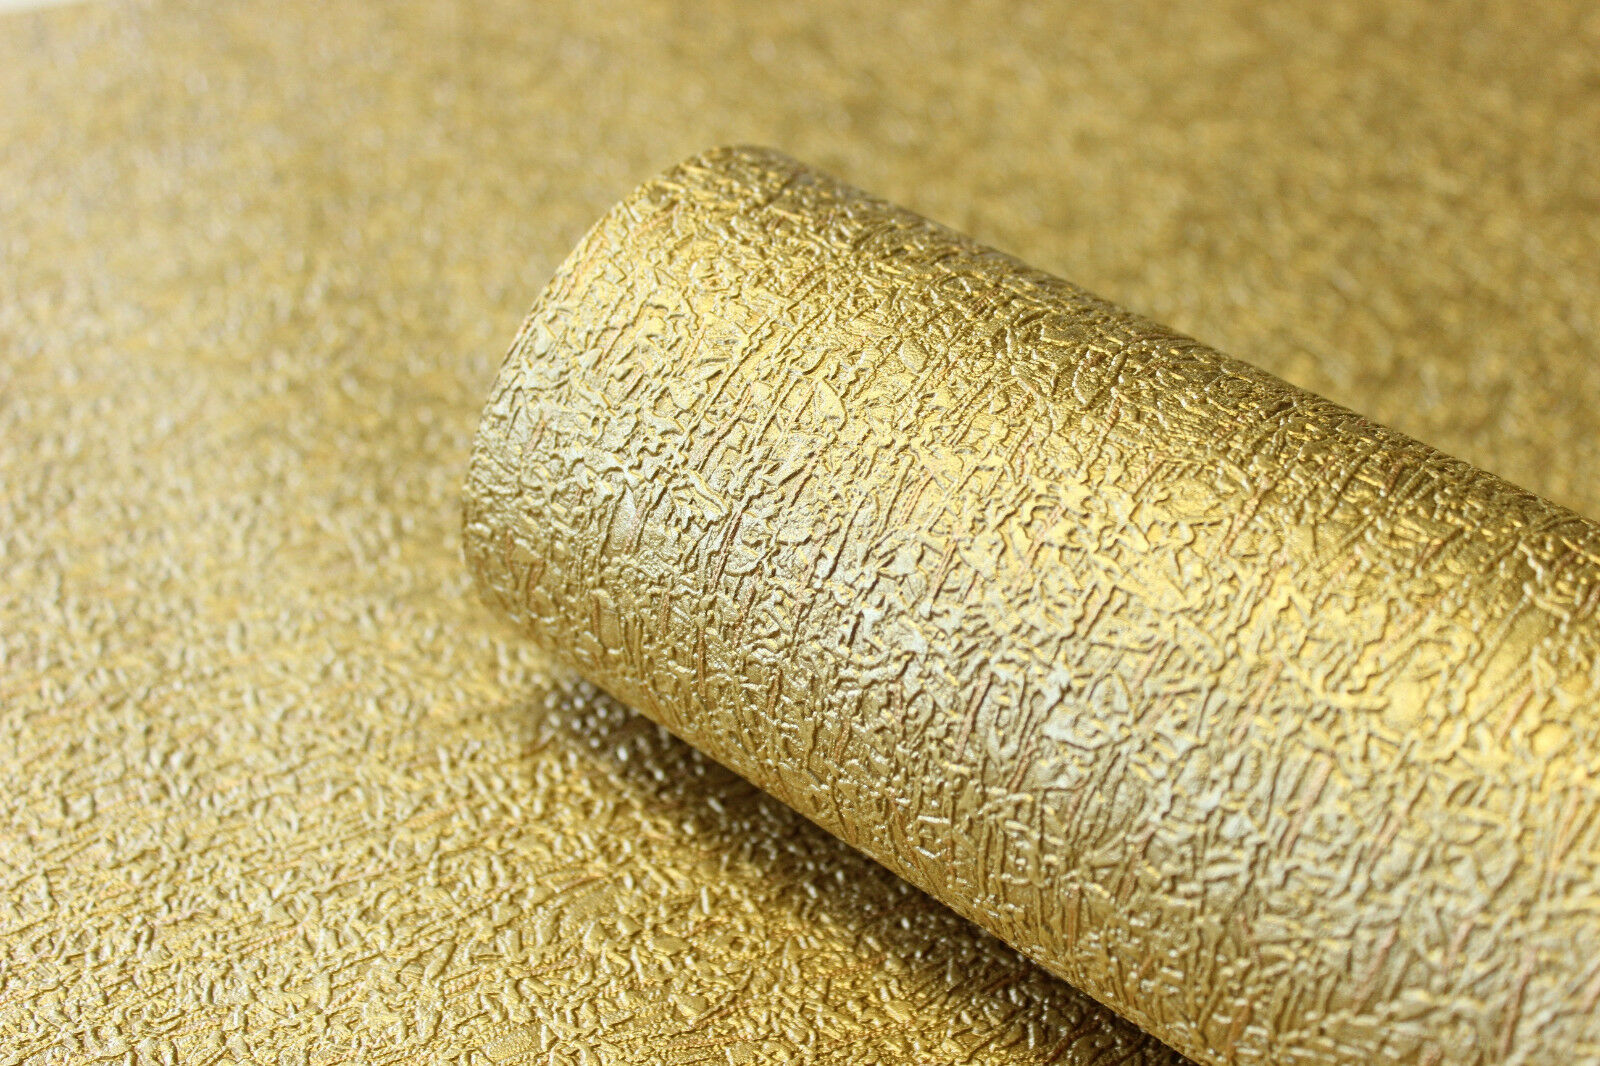 Vlies Tapete Gold Uni Struktur Hochwertige Qualitat 1004 3 Metallic